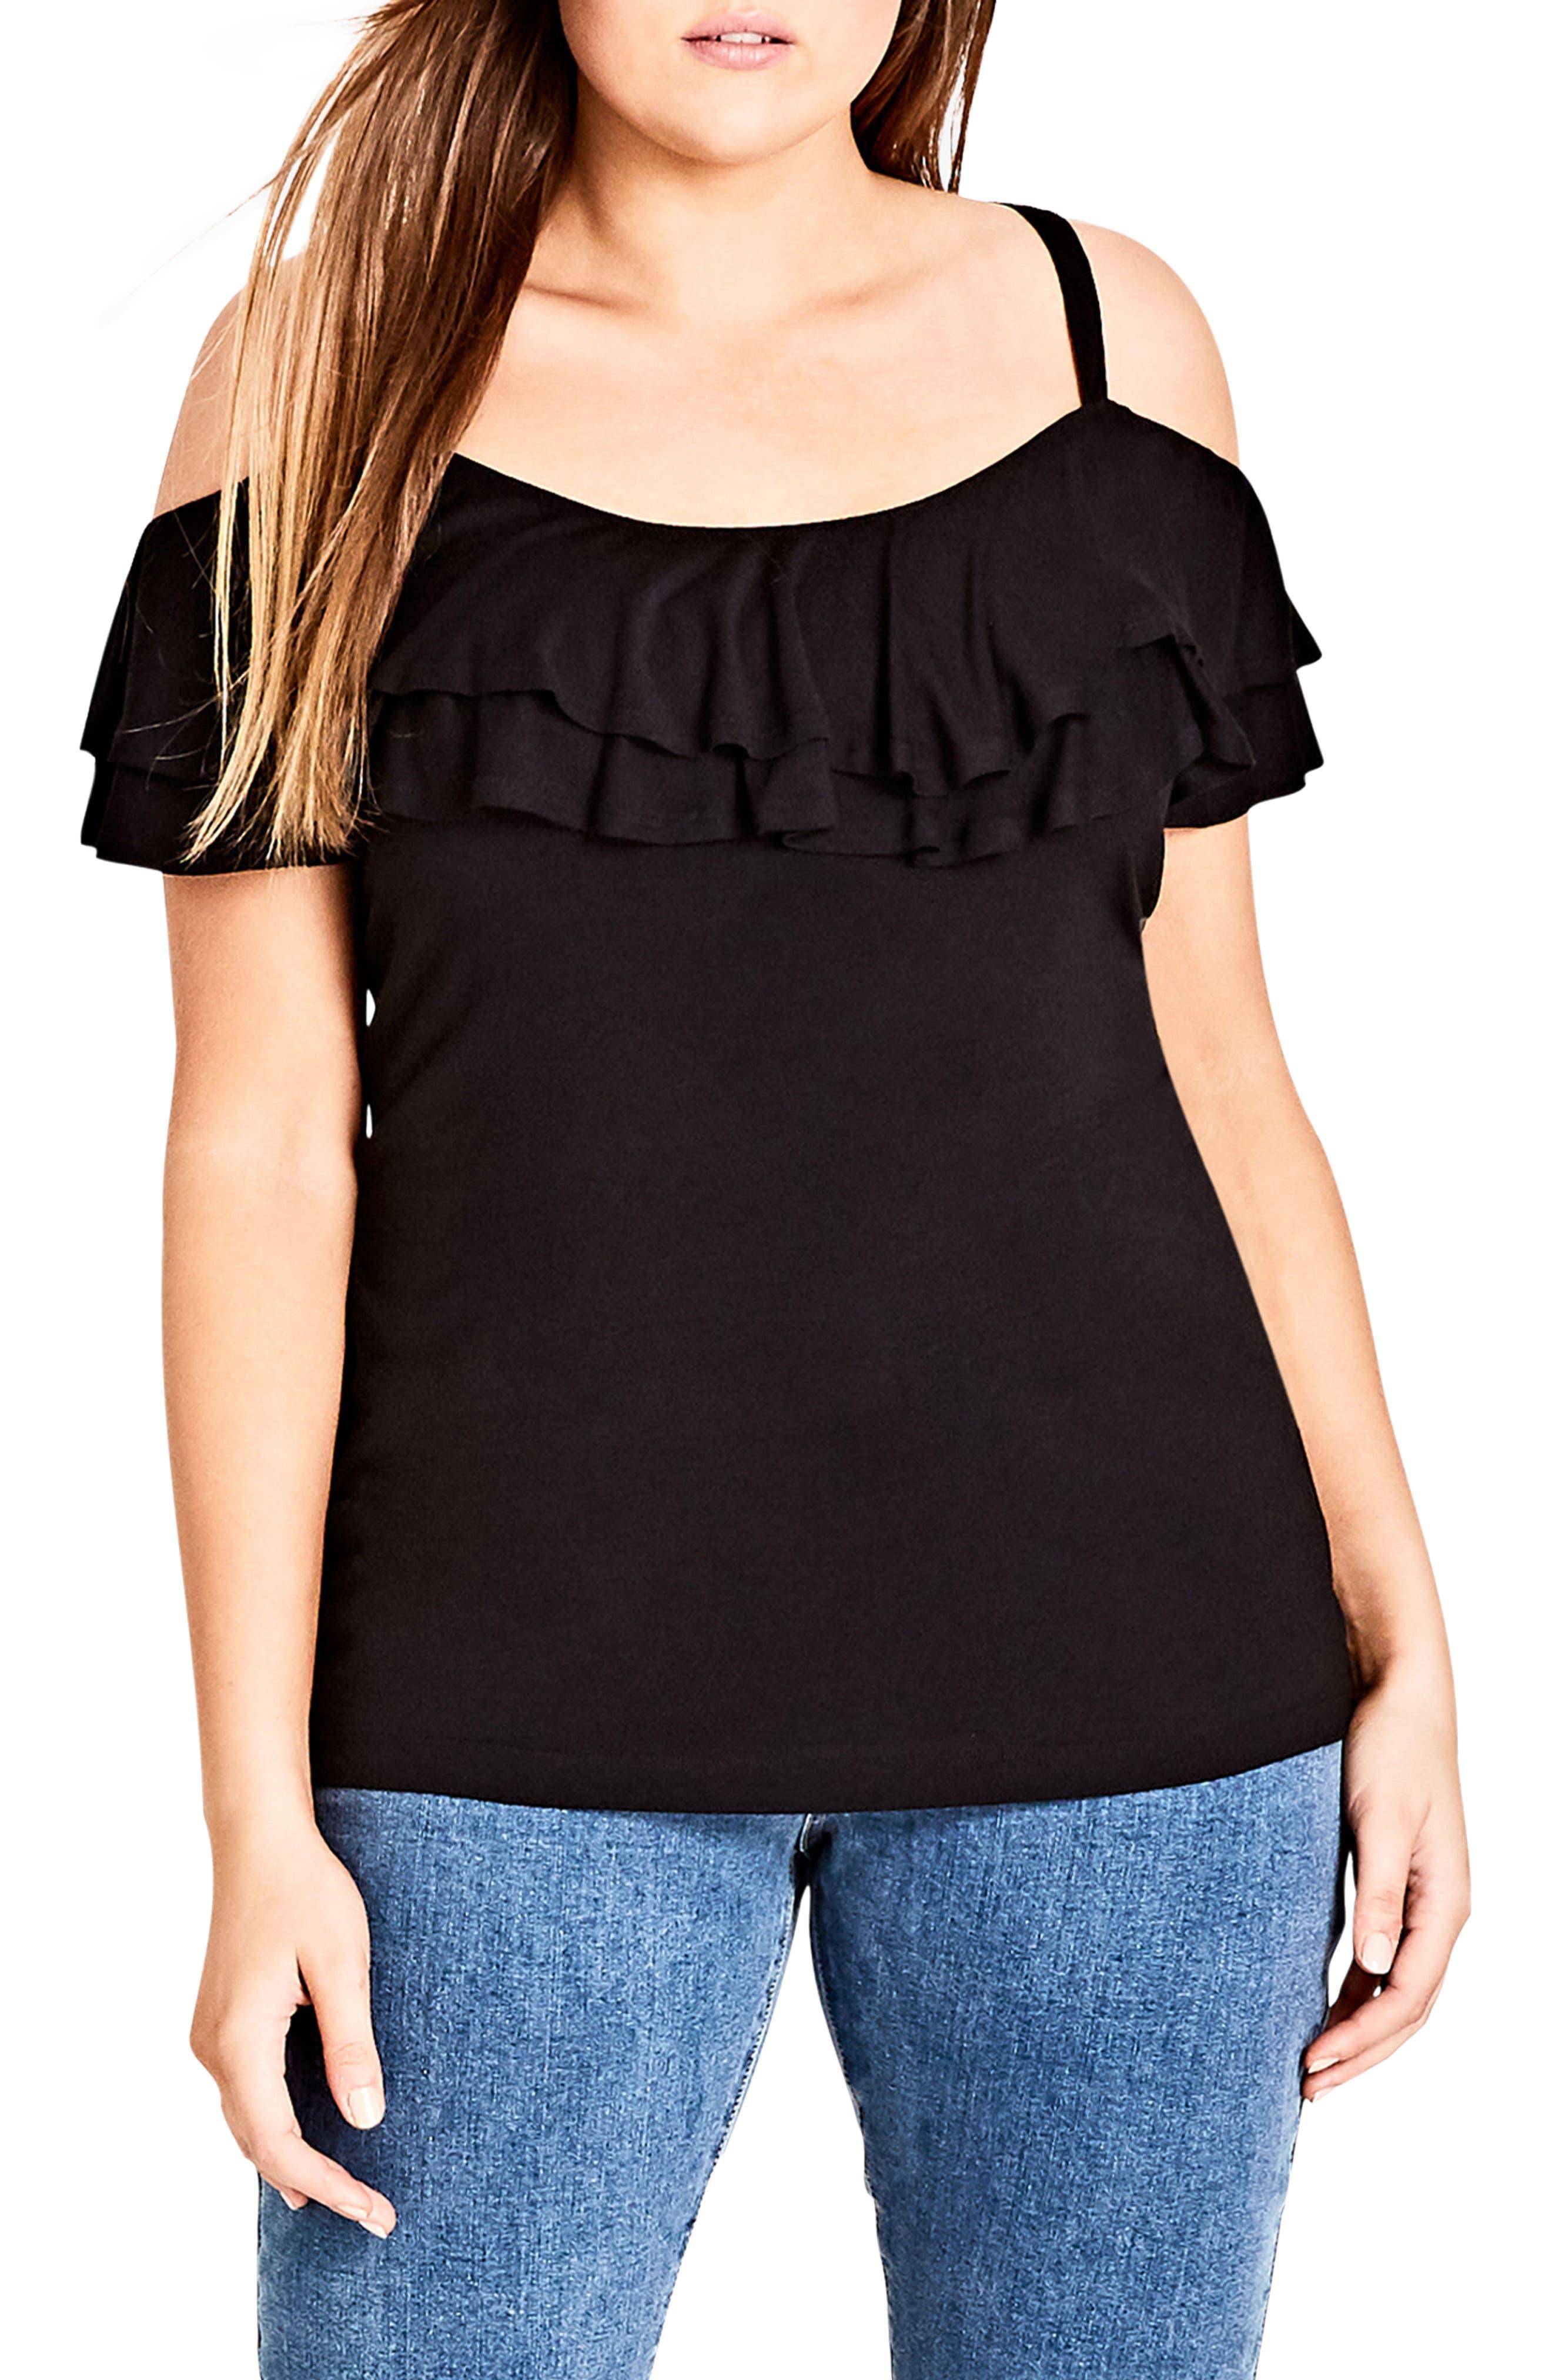 Ruffle Romance Off the Shoulder Top,                         Main,                         color, BLACK